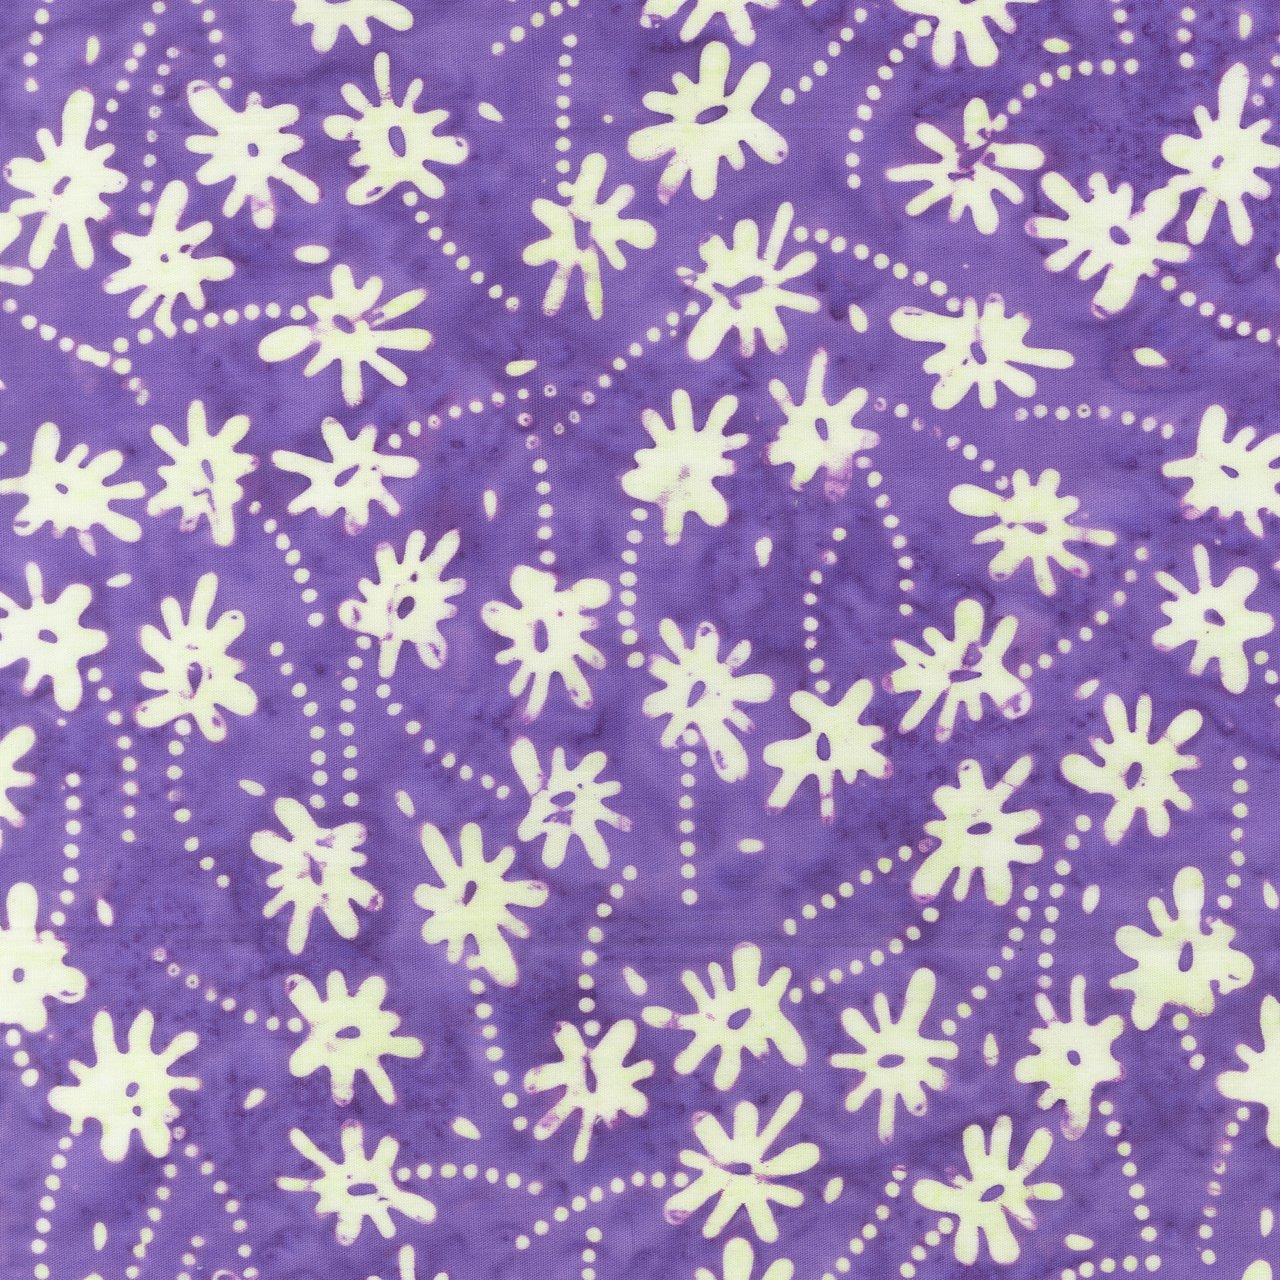 2051Q-X Art Inspired Light Iris, 1924 by Anthology Fabrics